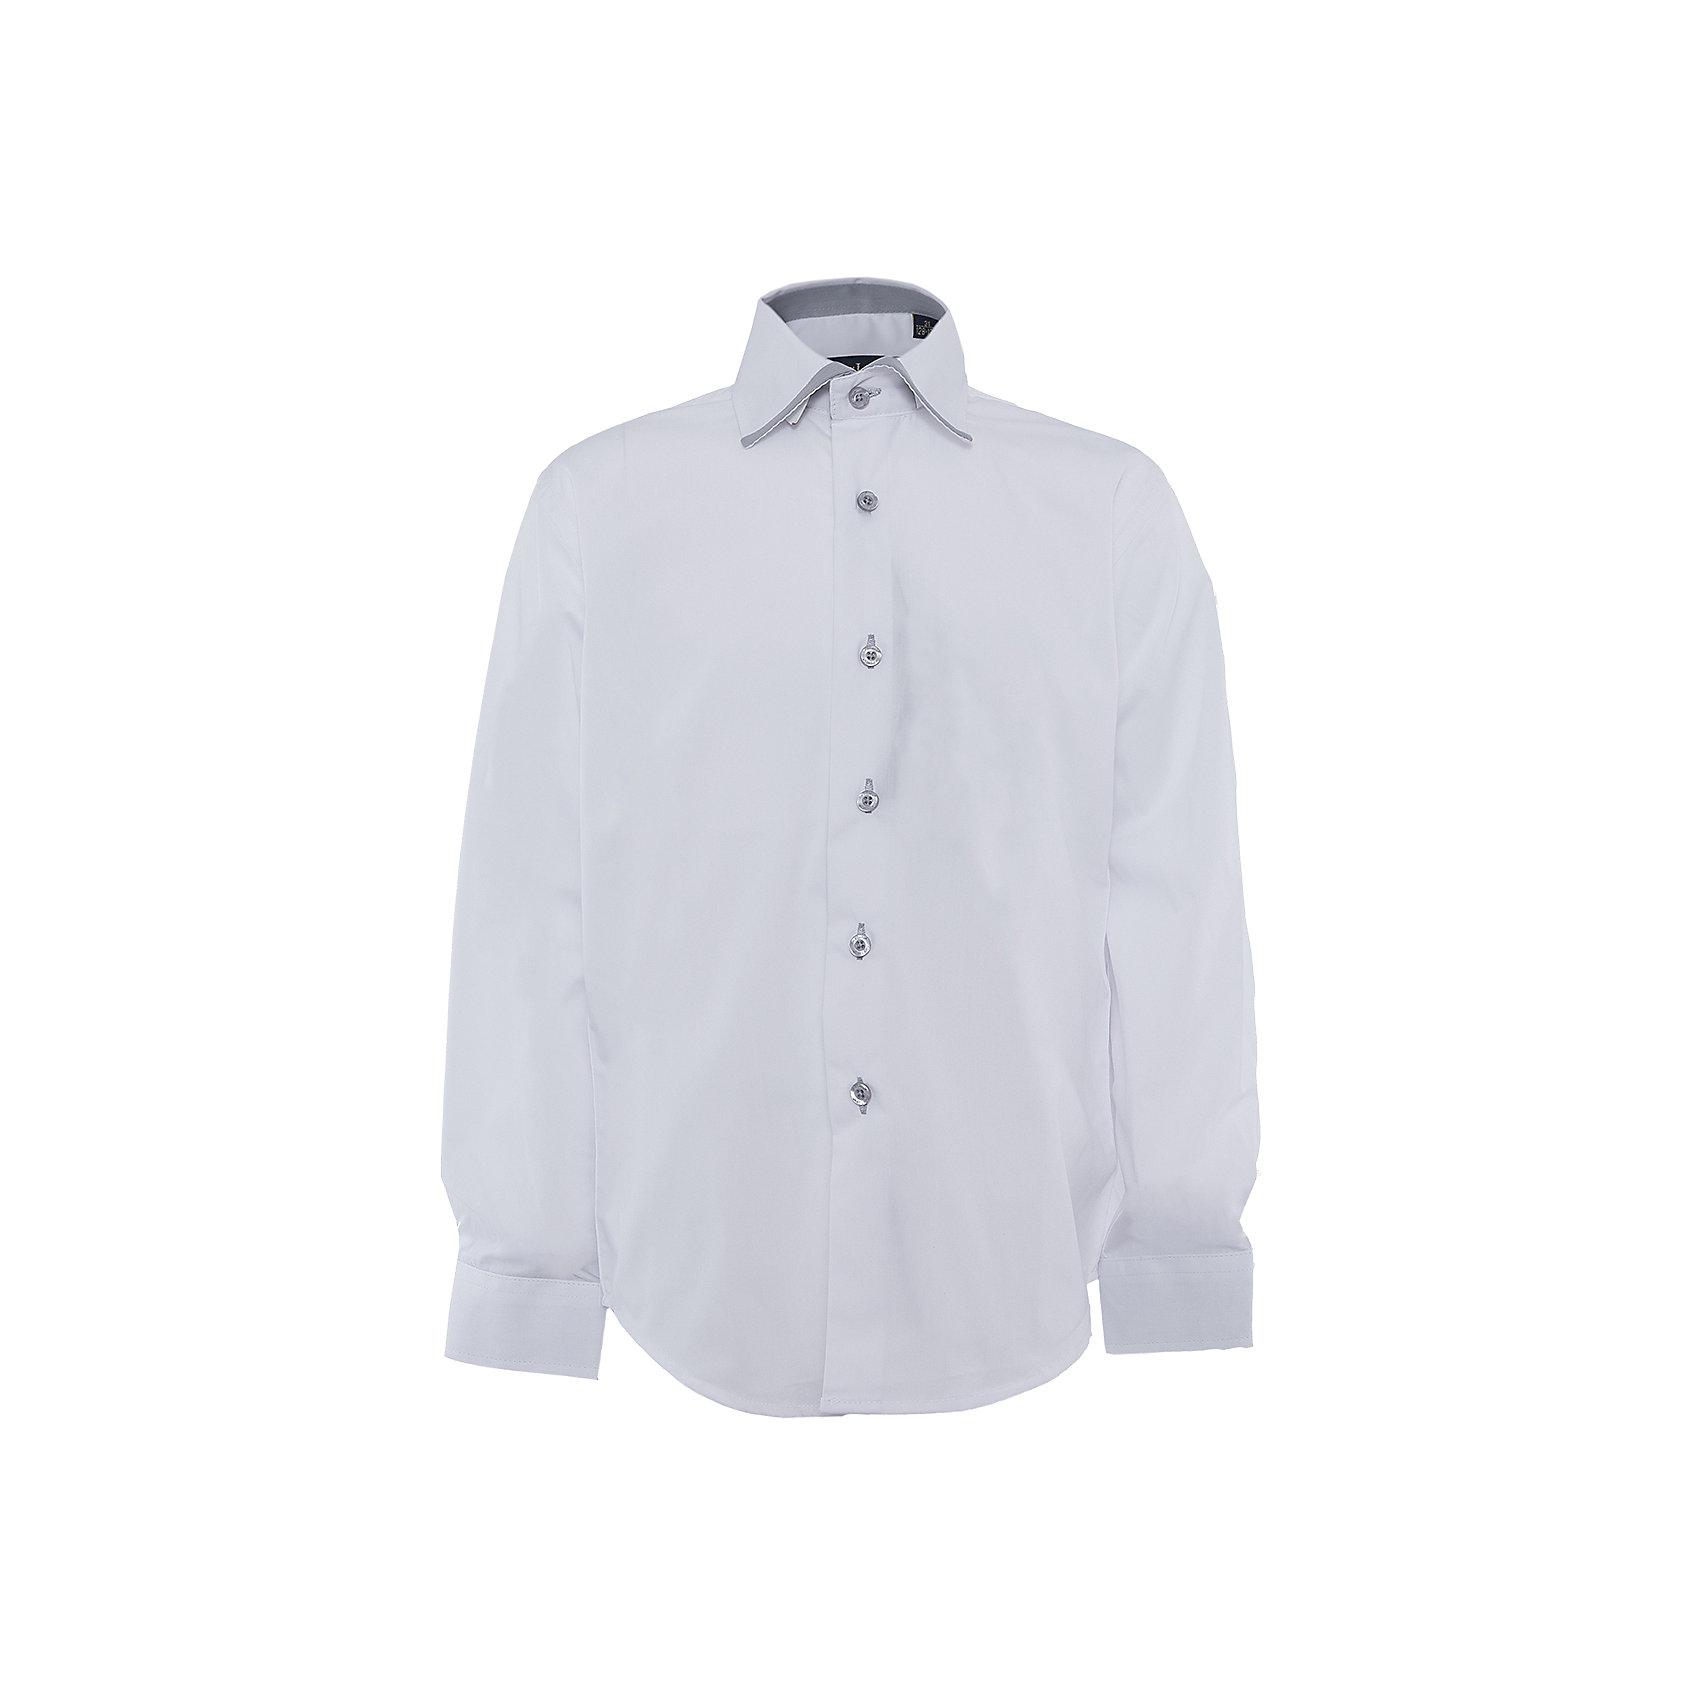 Рубашка для мальчика PREMIUM SkylakeБлузки и рубашки<br>Рубашка для мальчика PREMIUM от известного бренда Skylake<br>Состав:<br>80%хлопок 20%п/э<br><br>Ширина мм: 174<br>Глубина мм: 10<br>Высота мм: 169<br>Вес г: 157<br>Цвет: серый<br>Возраст от месяцев: 144<br>Возраст до месяцев: 156<br>Пол: Мужской<br>Возраст: Детский<br>Размер: 158,152,146,122,128,134,140<br>SKU: 4877759